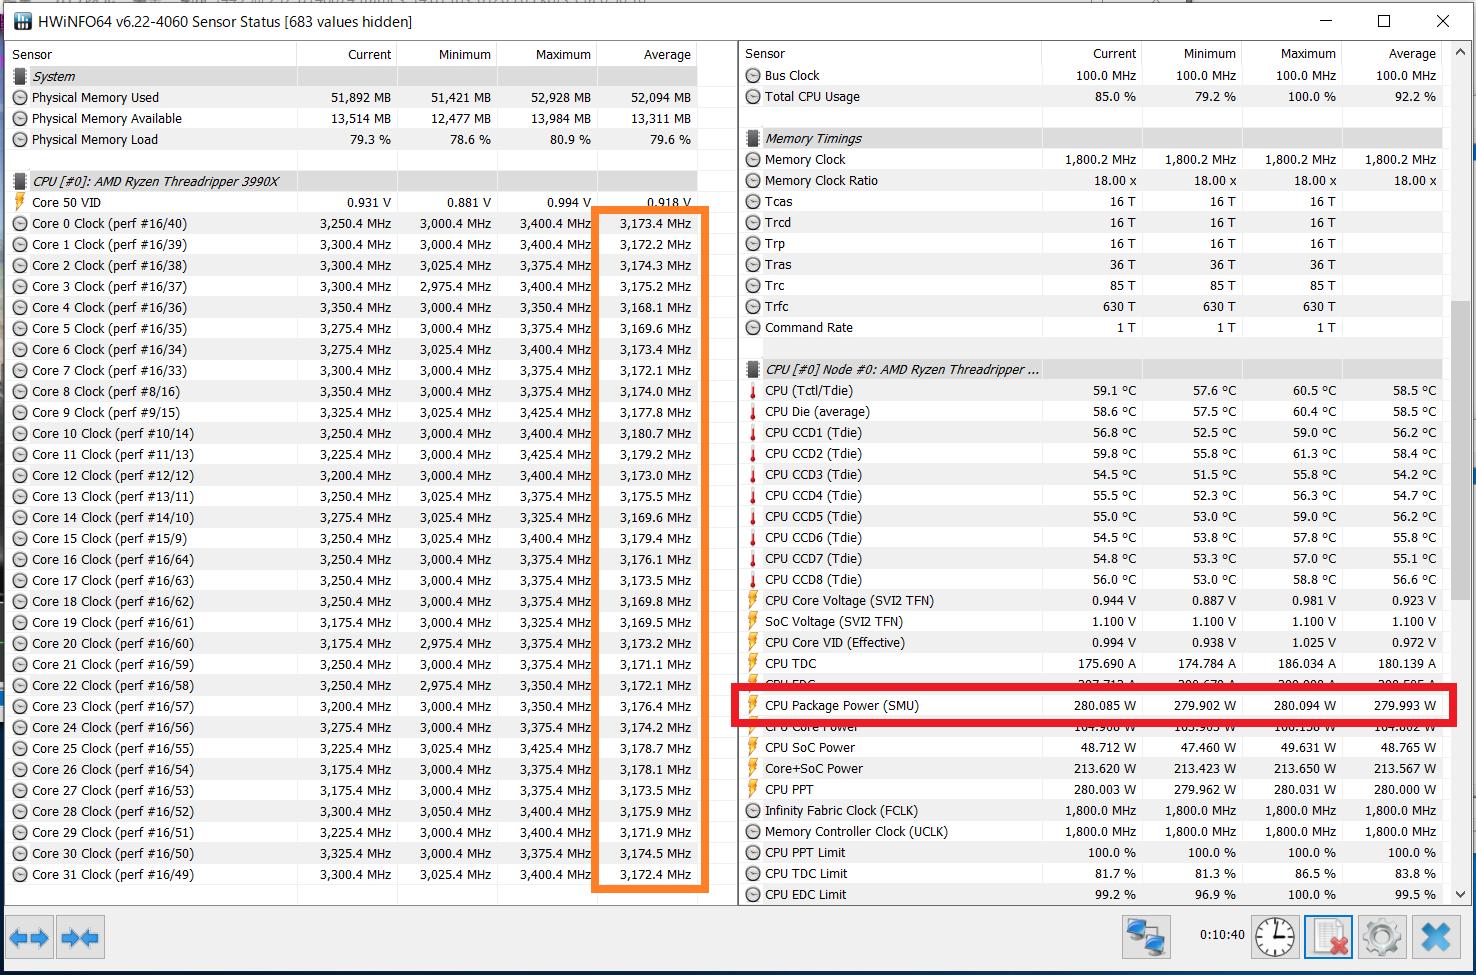 AMD Ryzen Threadripper 3990X_Core-Clock_Boost_Multi